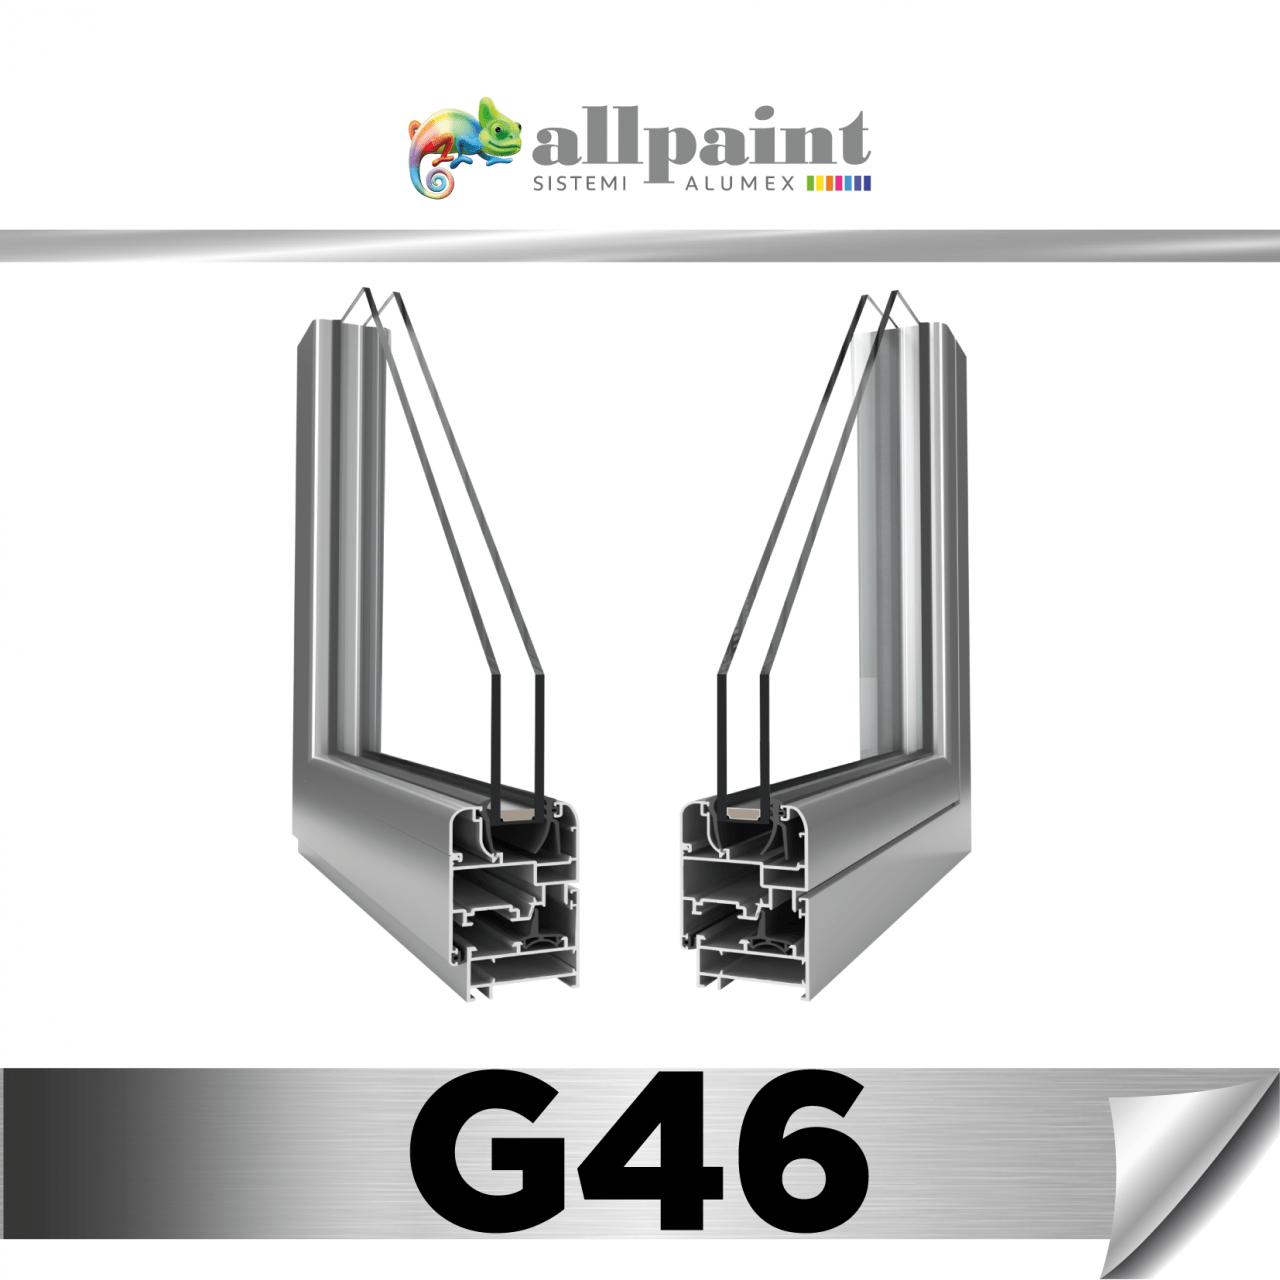 https://www.allpaint.it/wp-content/uploads/2021/08/G46-ALLPAINT-1280x1280.png